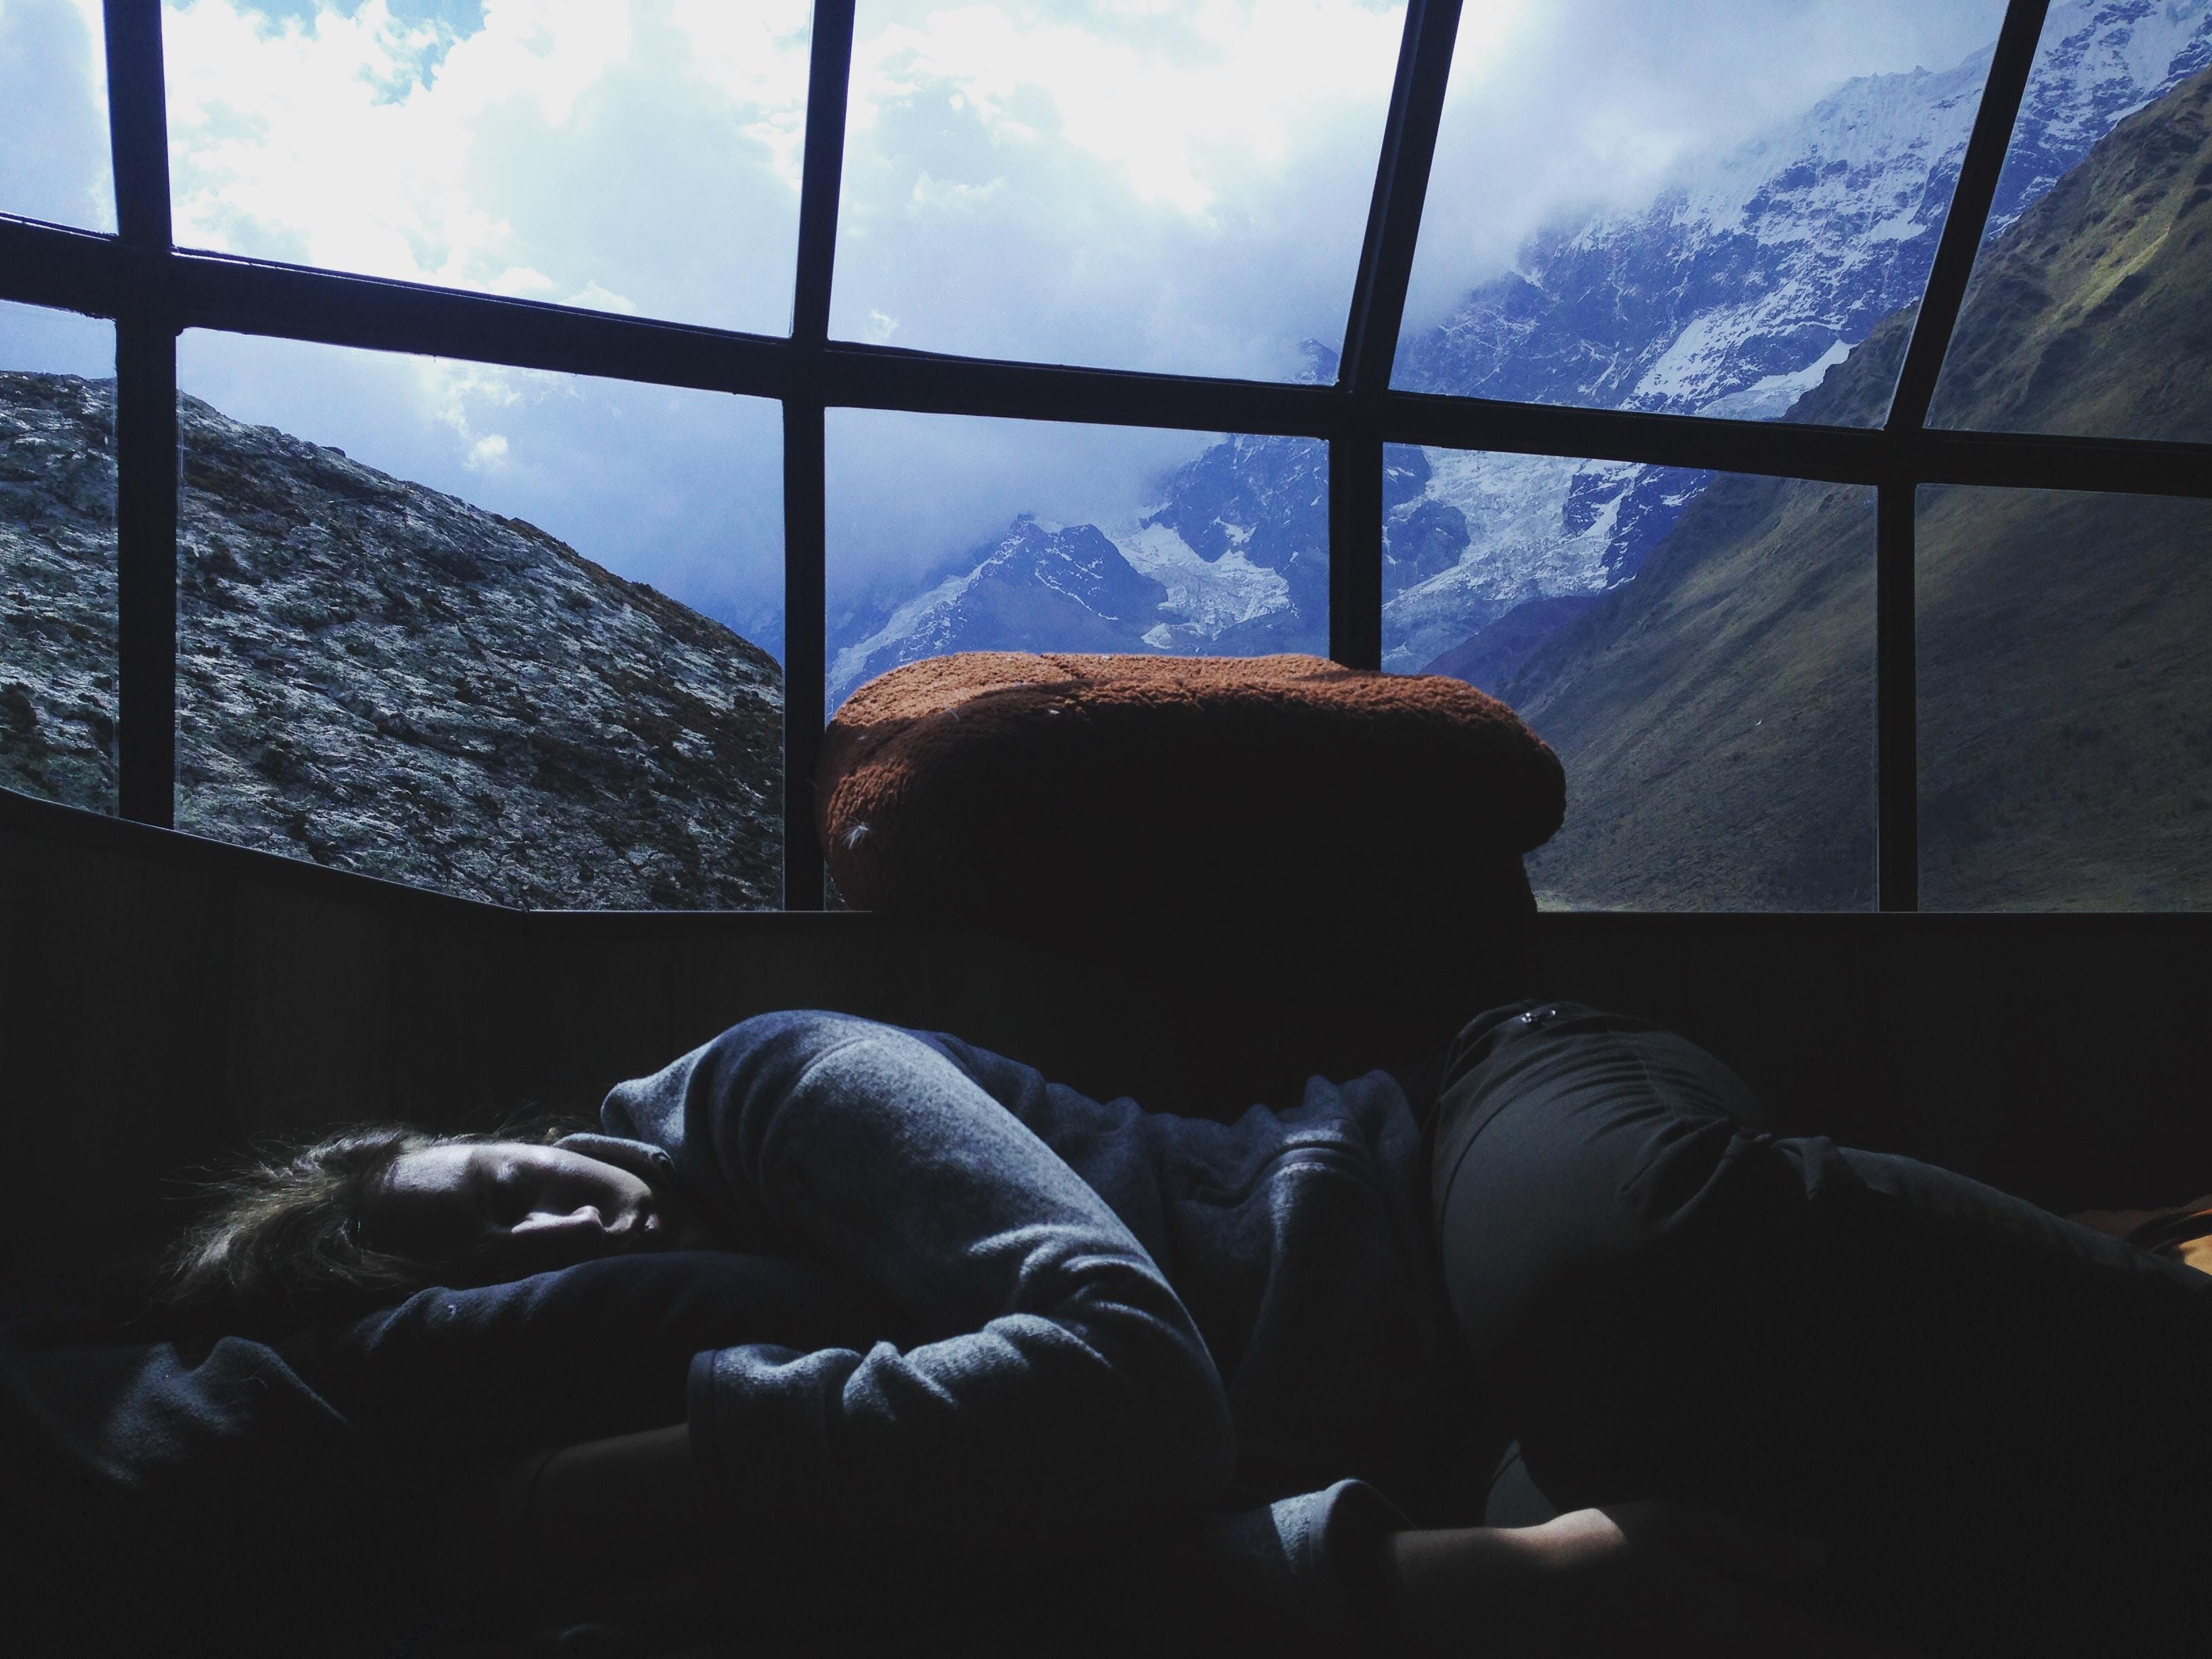 person sleeping near window